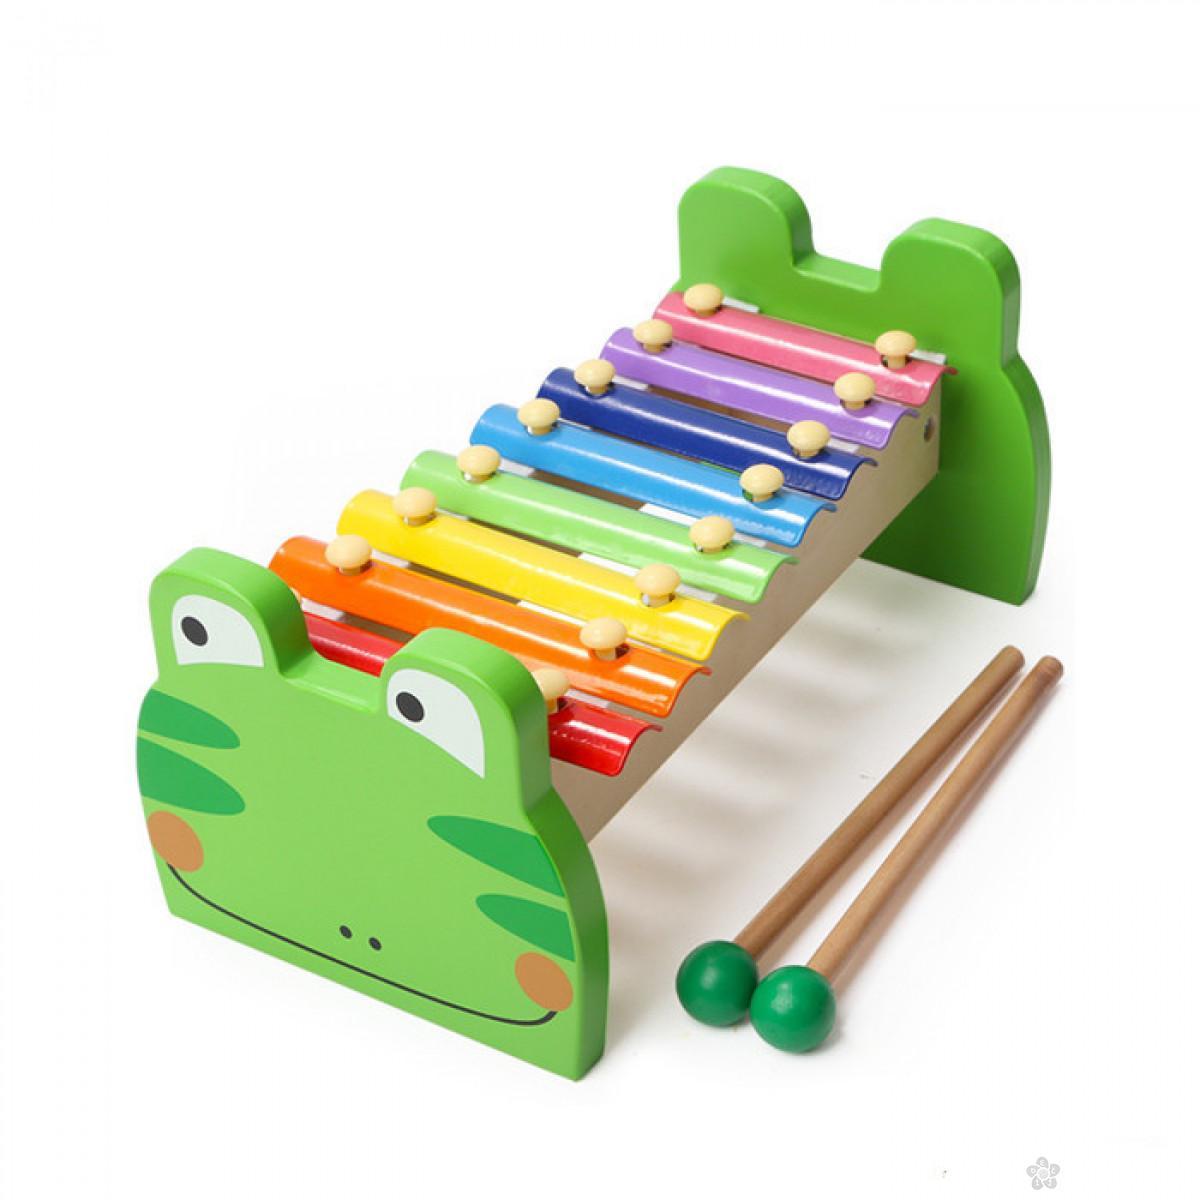 Drvena igračka ksilofon žabac ToP Bright 7136